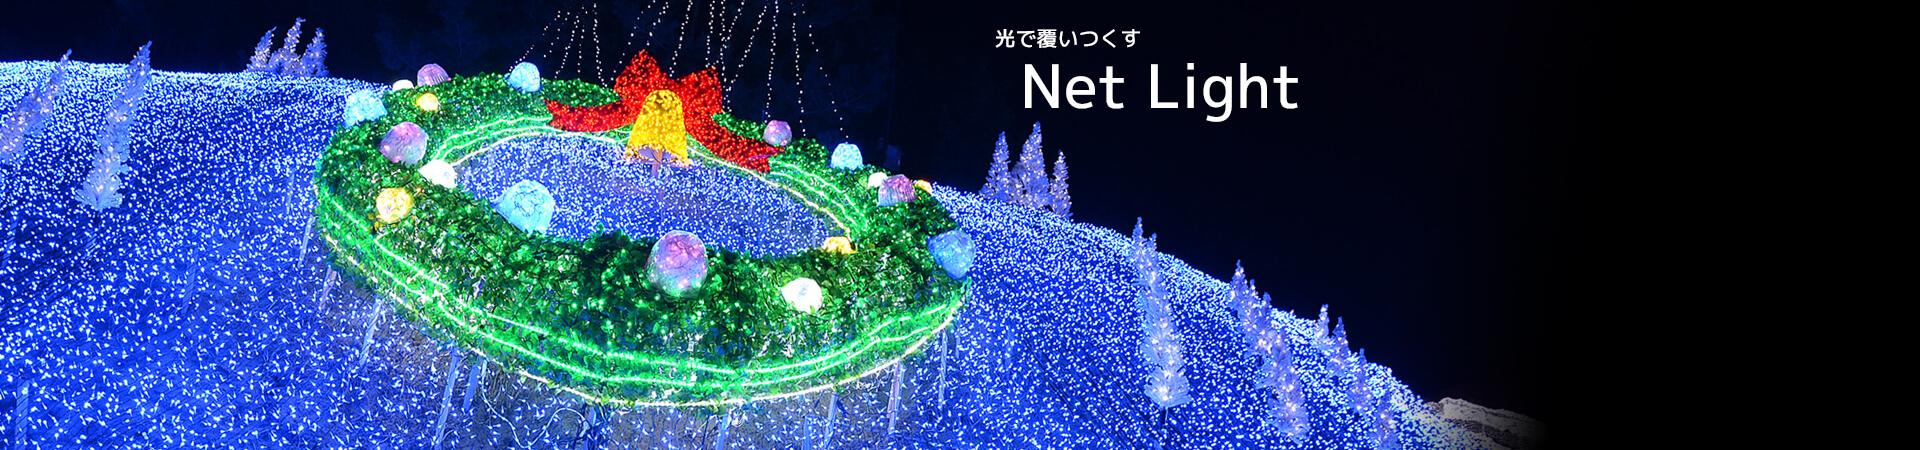 LEDイルミネーション ネットライト